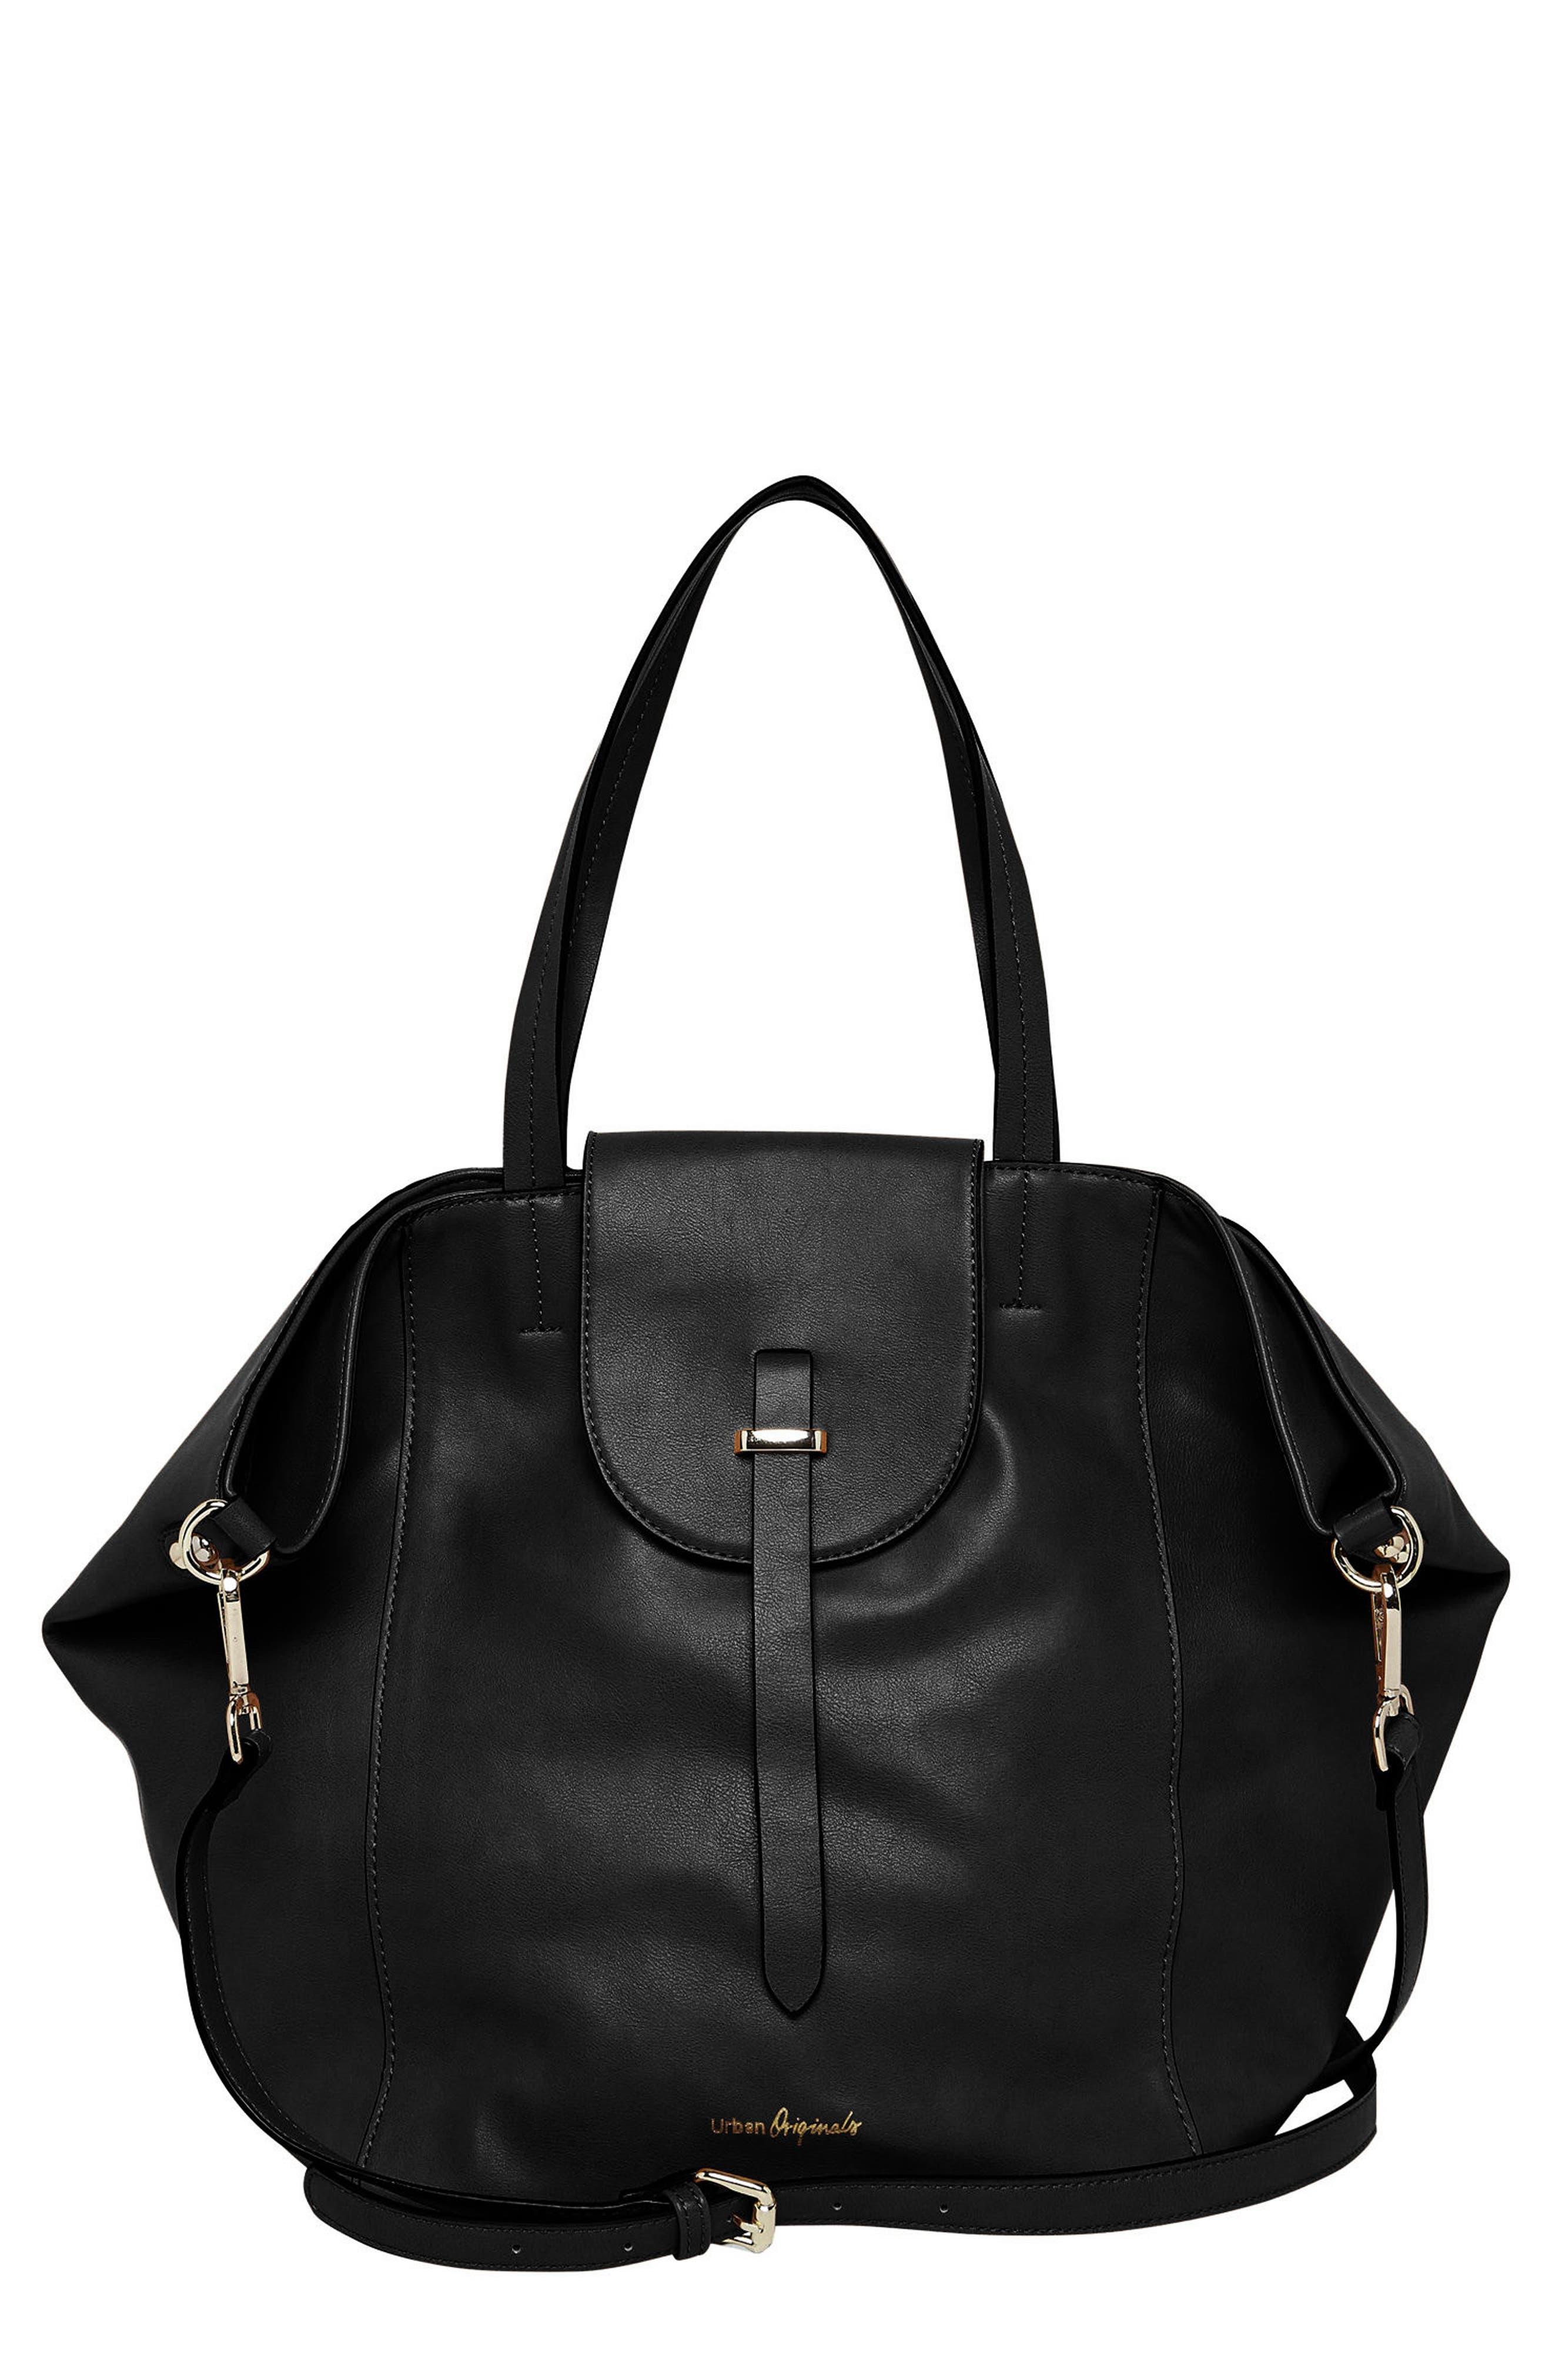 Urban Orginals Desire Vegan Leather Bucket Bag